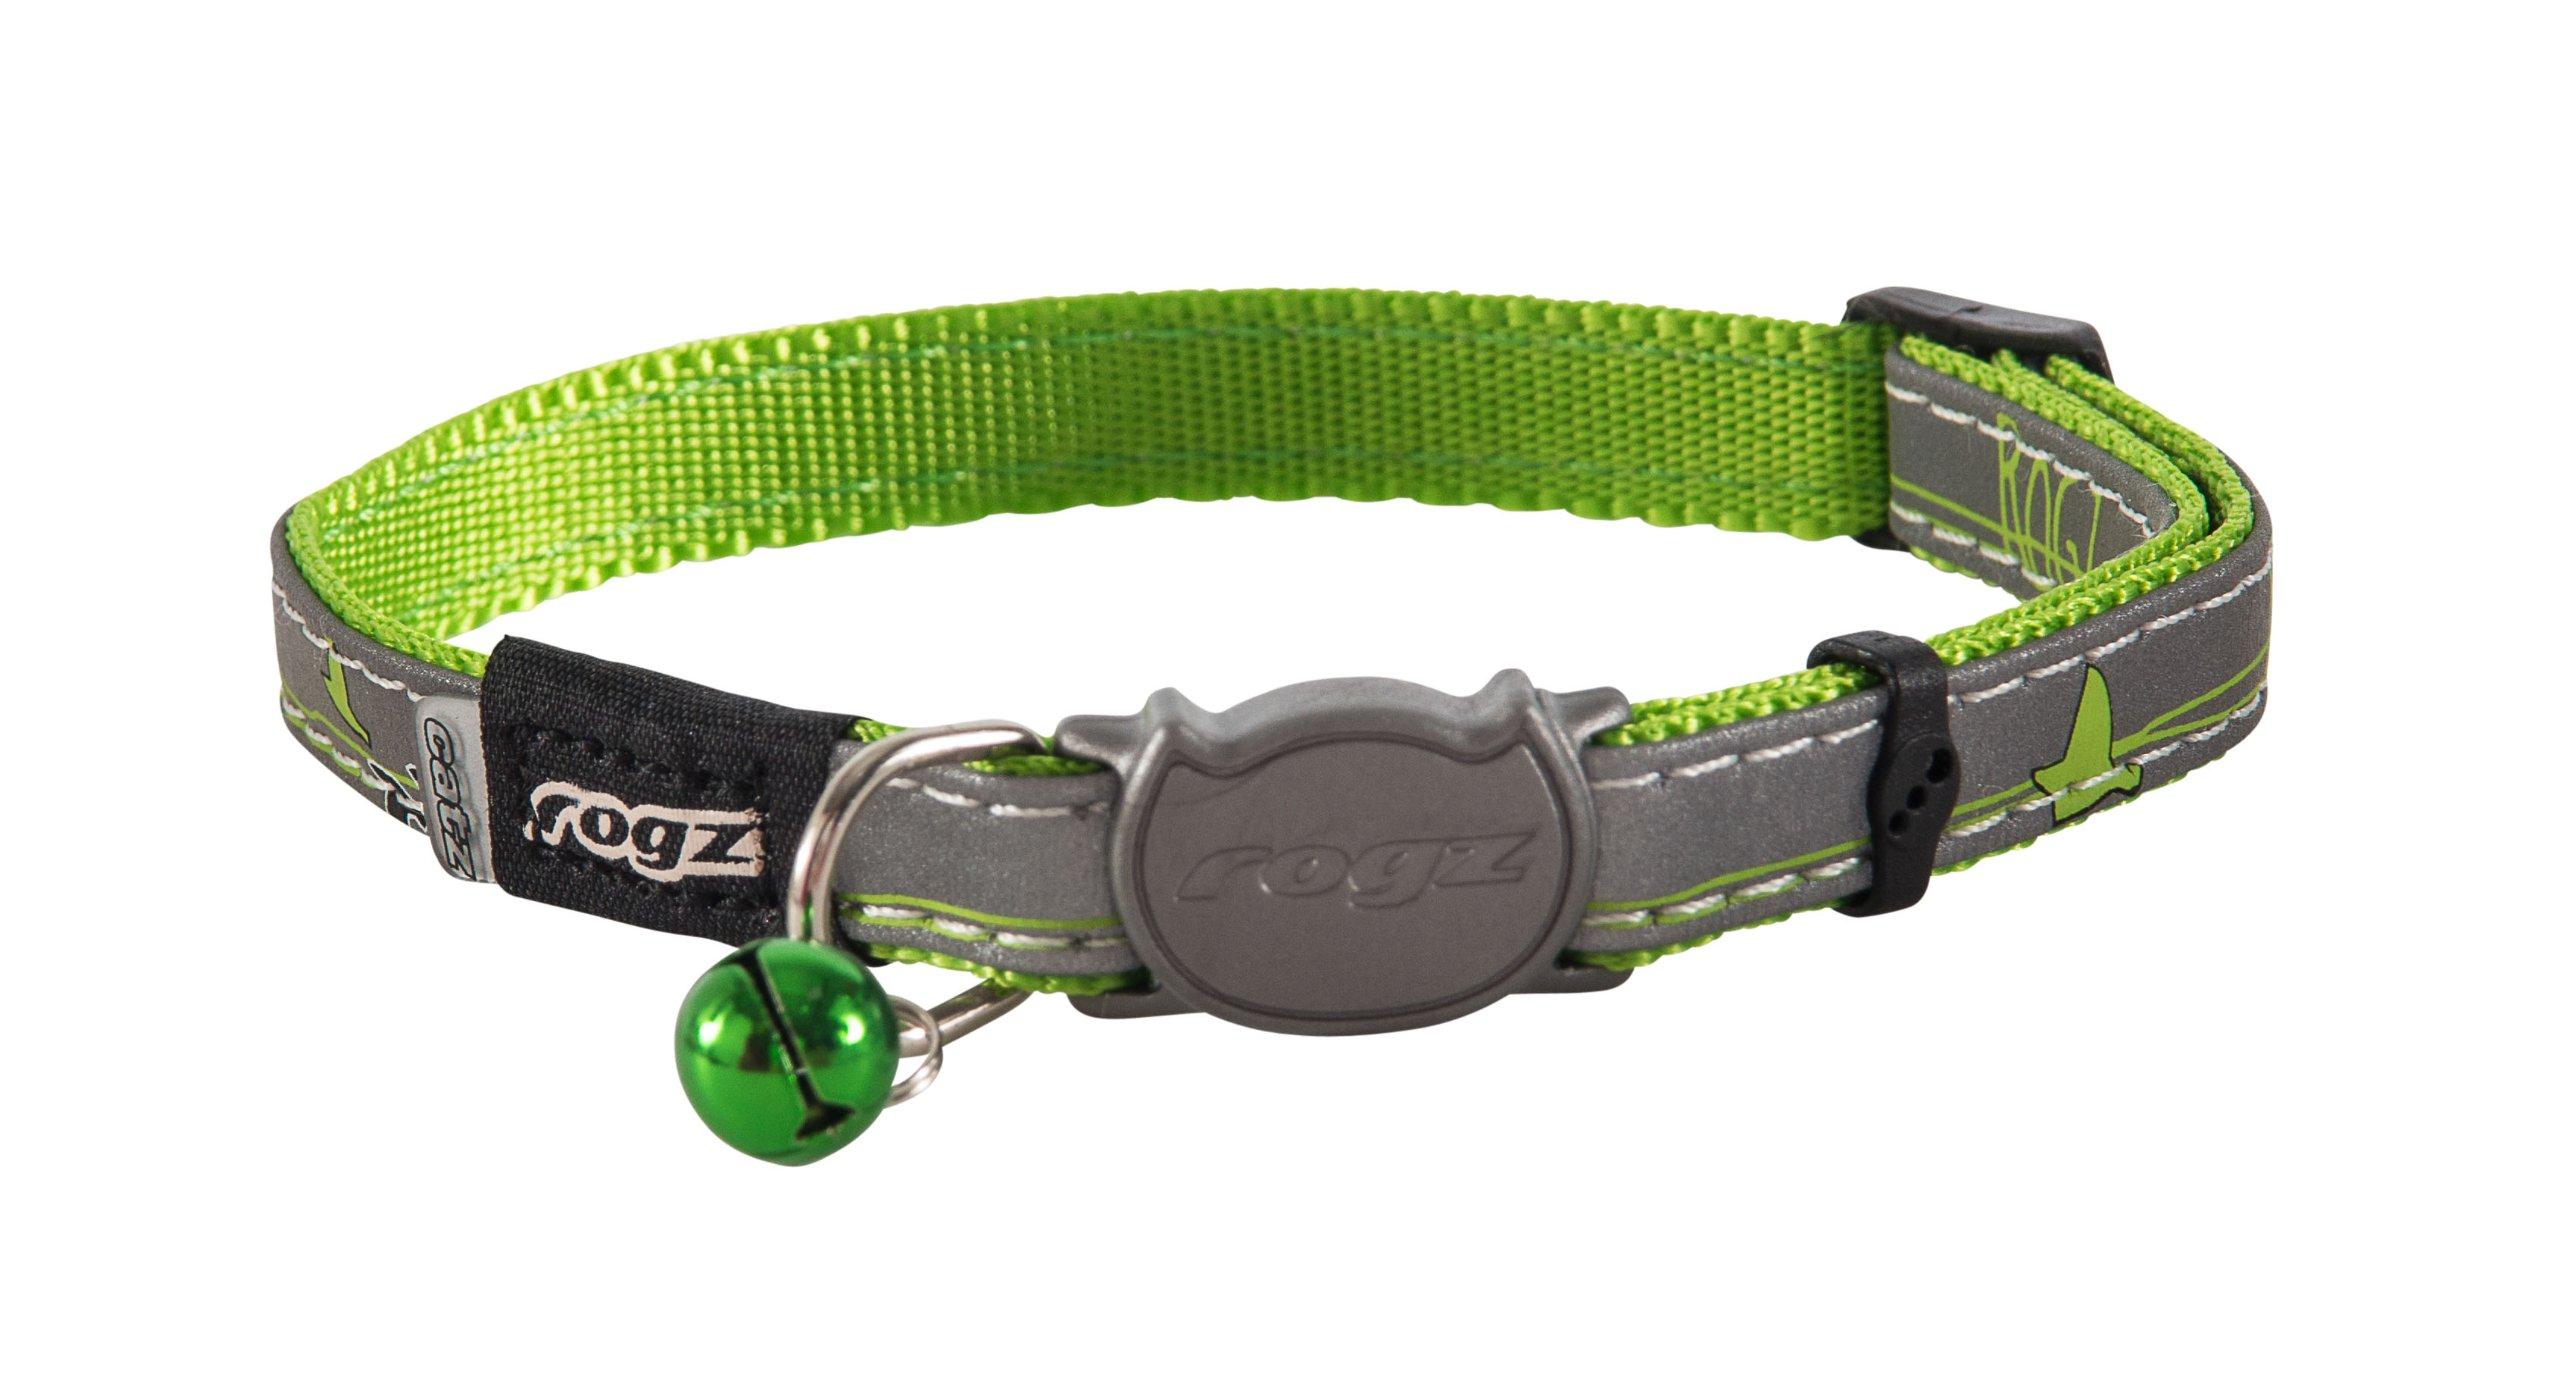 ROGZ CB08-L Reflective Cat Collar, Lime, One Size